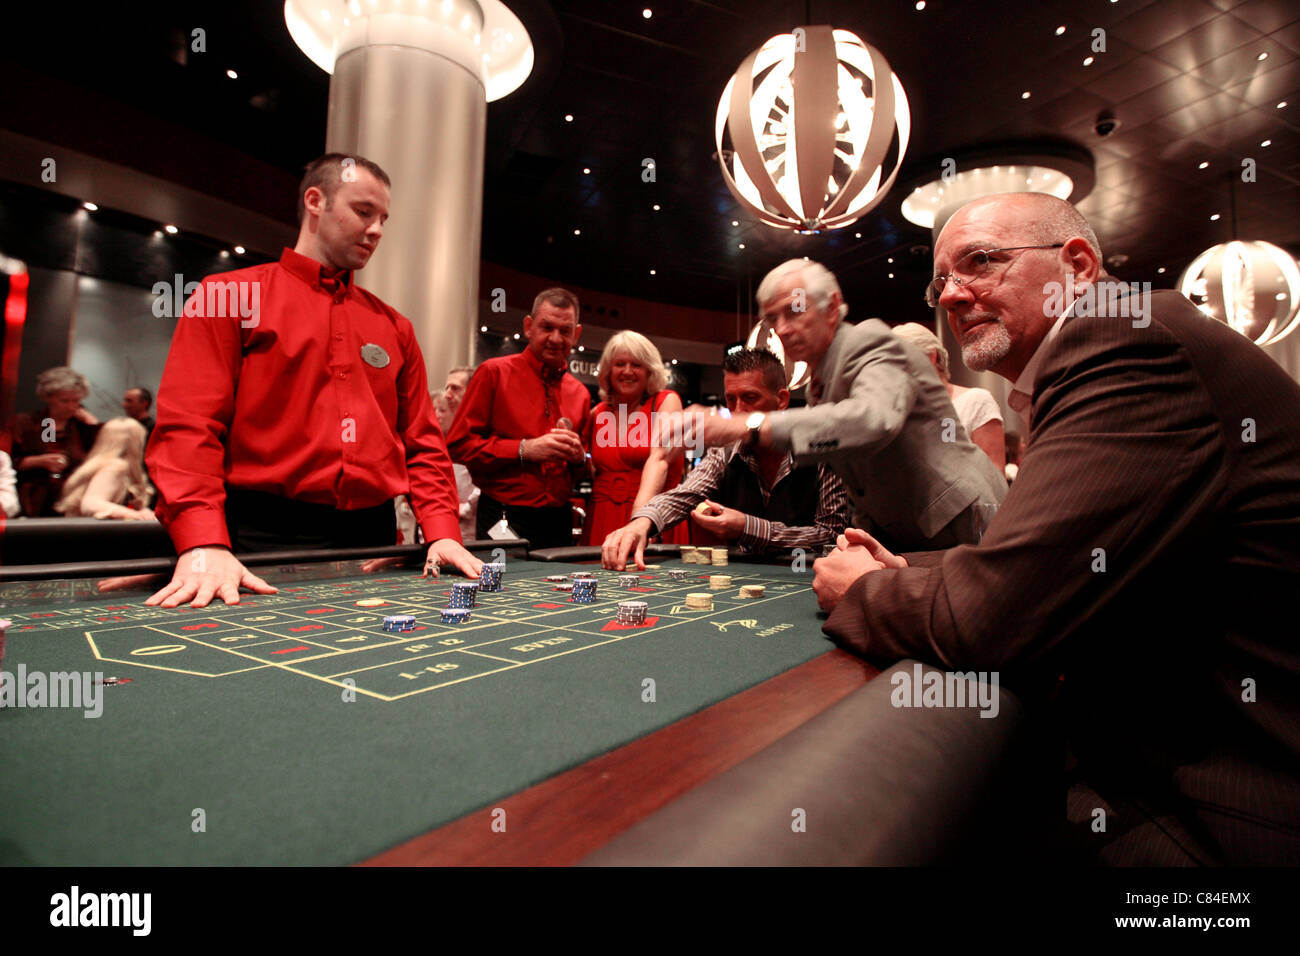 Lucky creek casino bonus codes no deposit